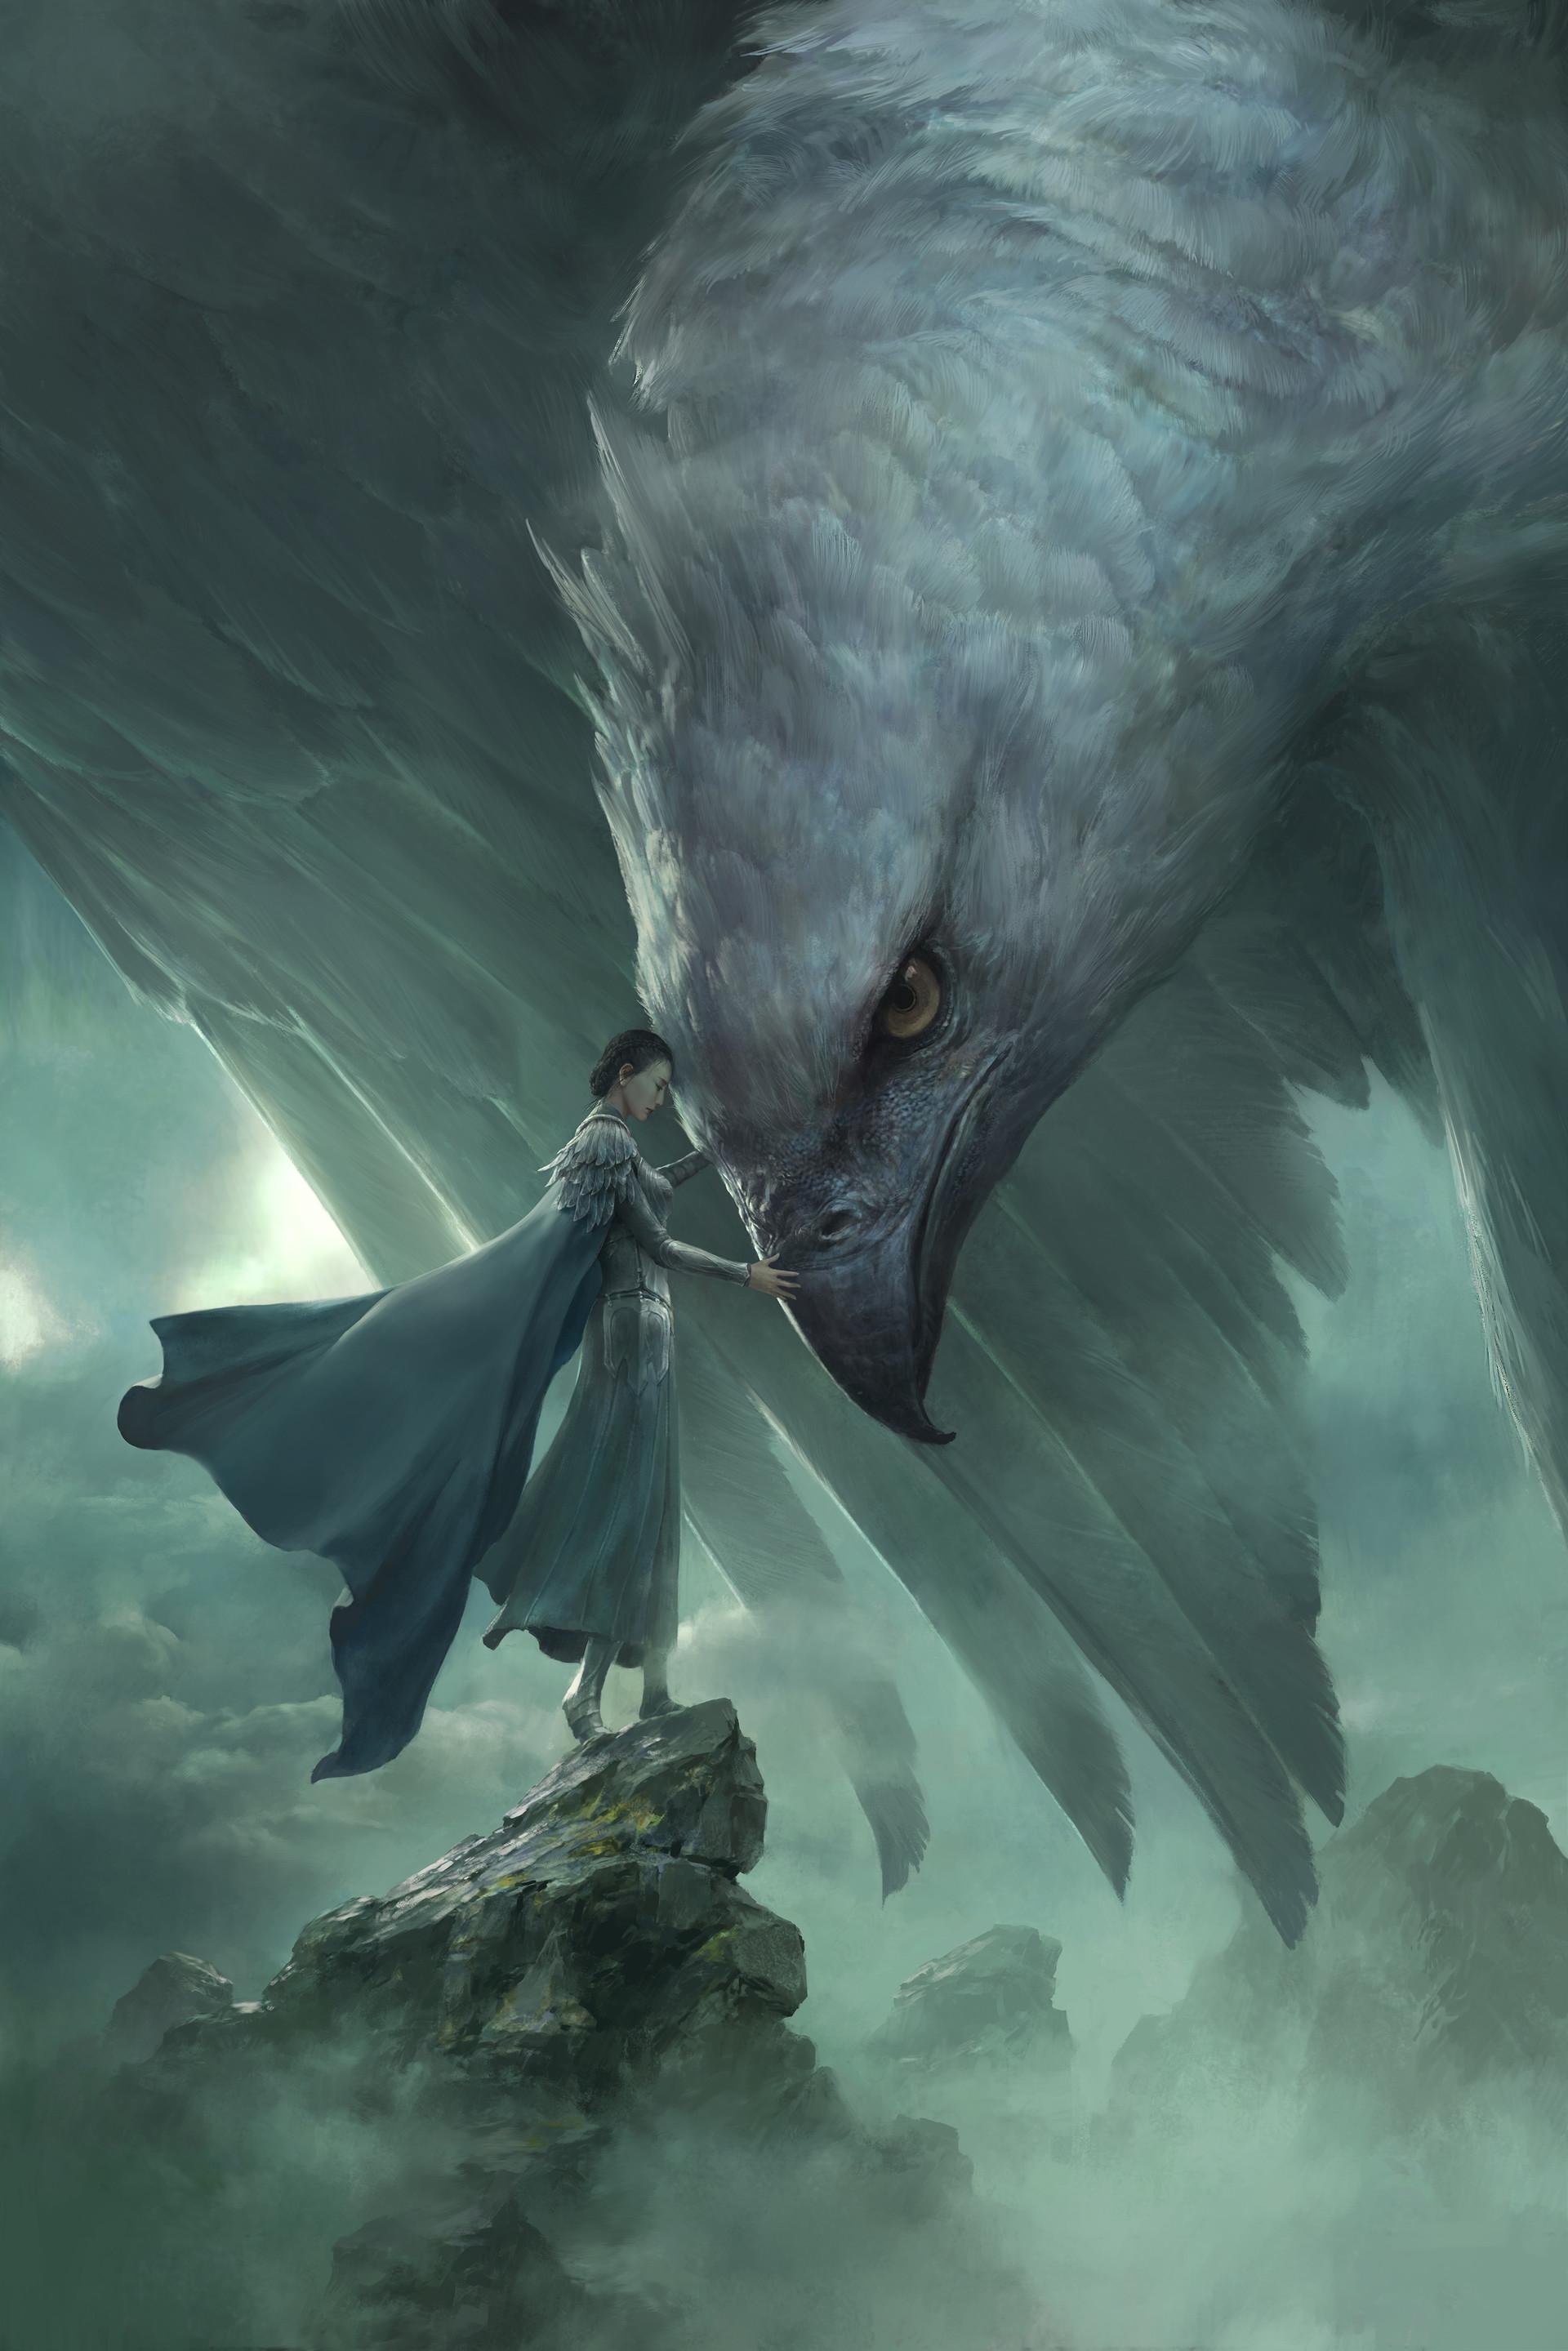 Behemoths & Leviathans III - Imgur